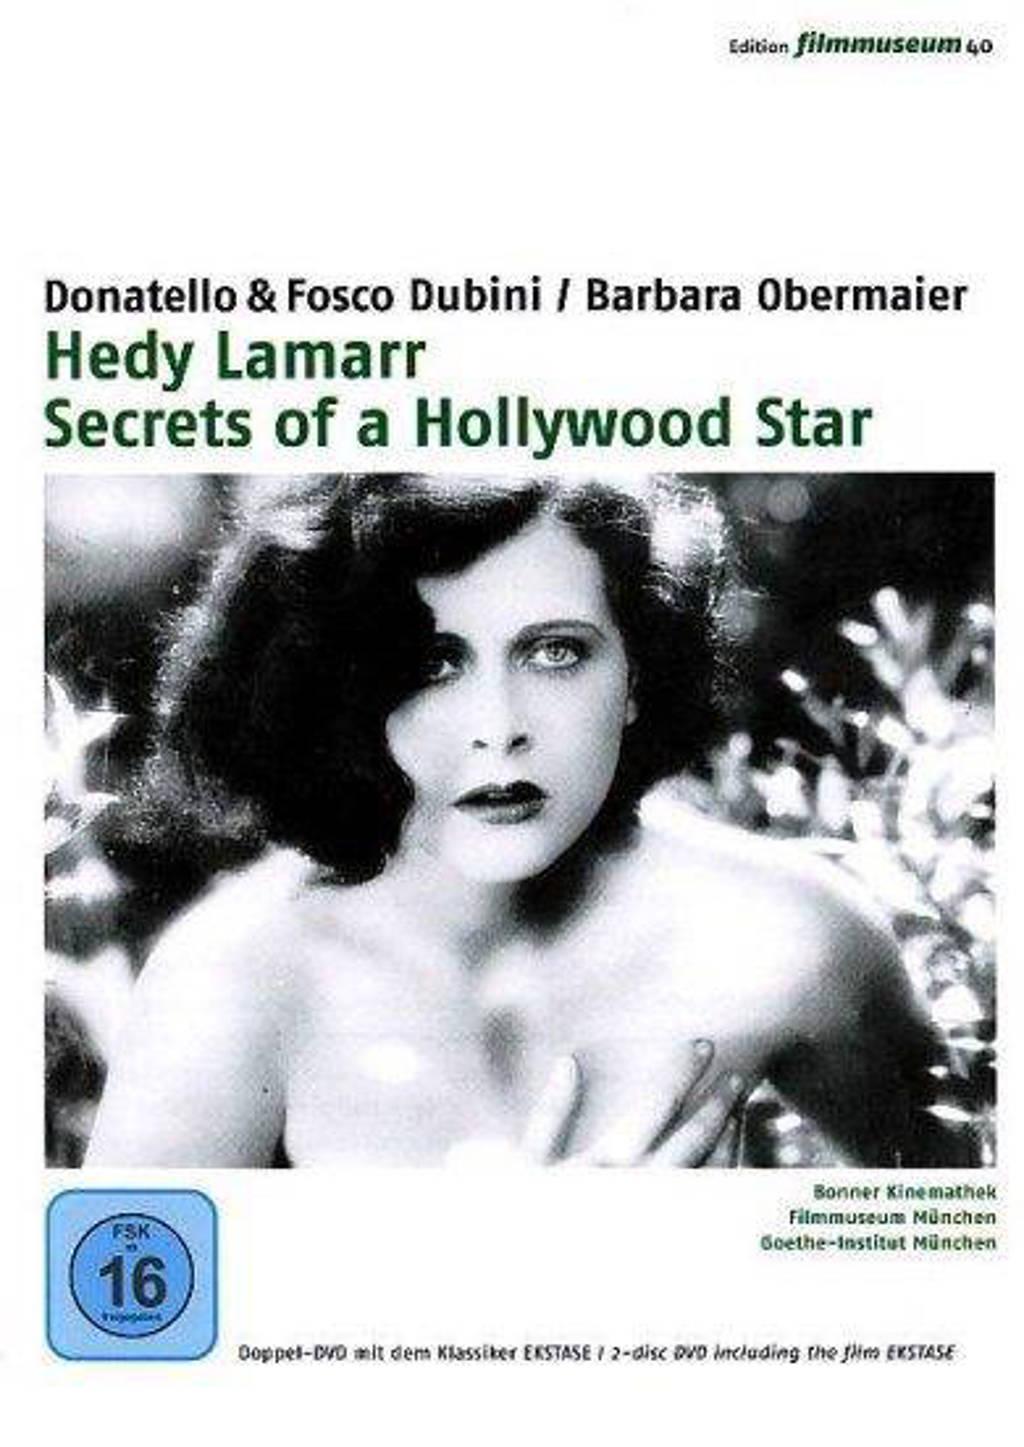 Hedy Lamarr - Secrets of a hollywood star (DVD)